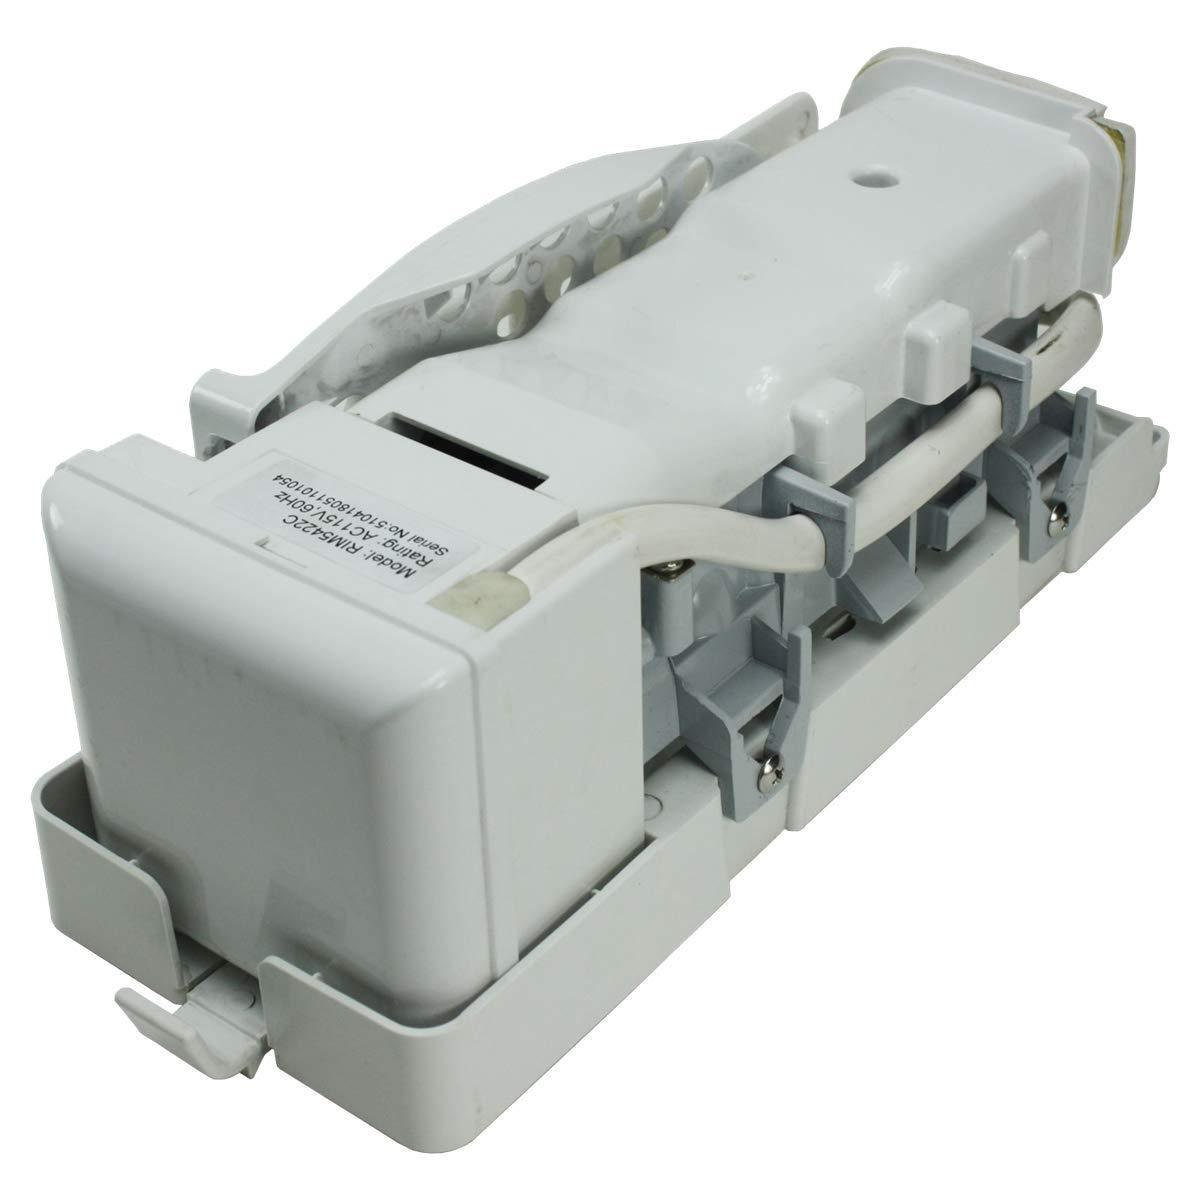 Edgewater Parts DA97-05422A Ice Maker Compatible Samsung Refrigerator